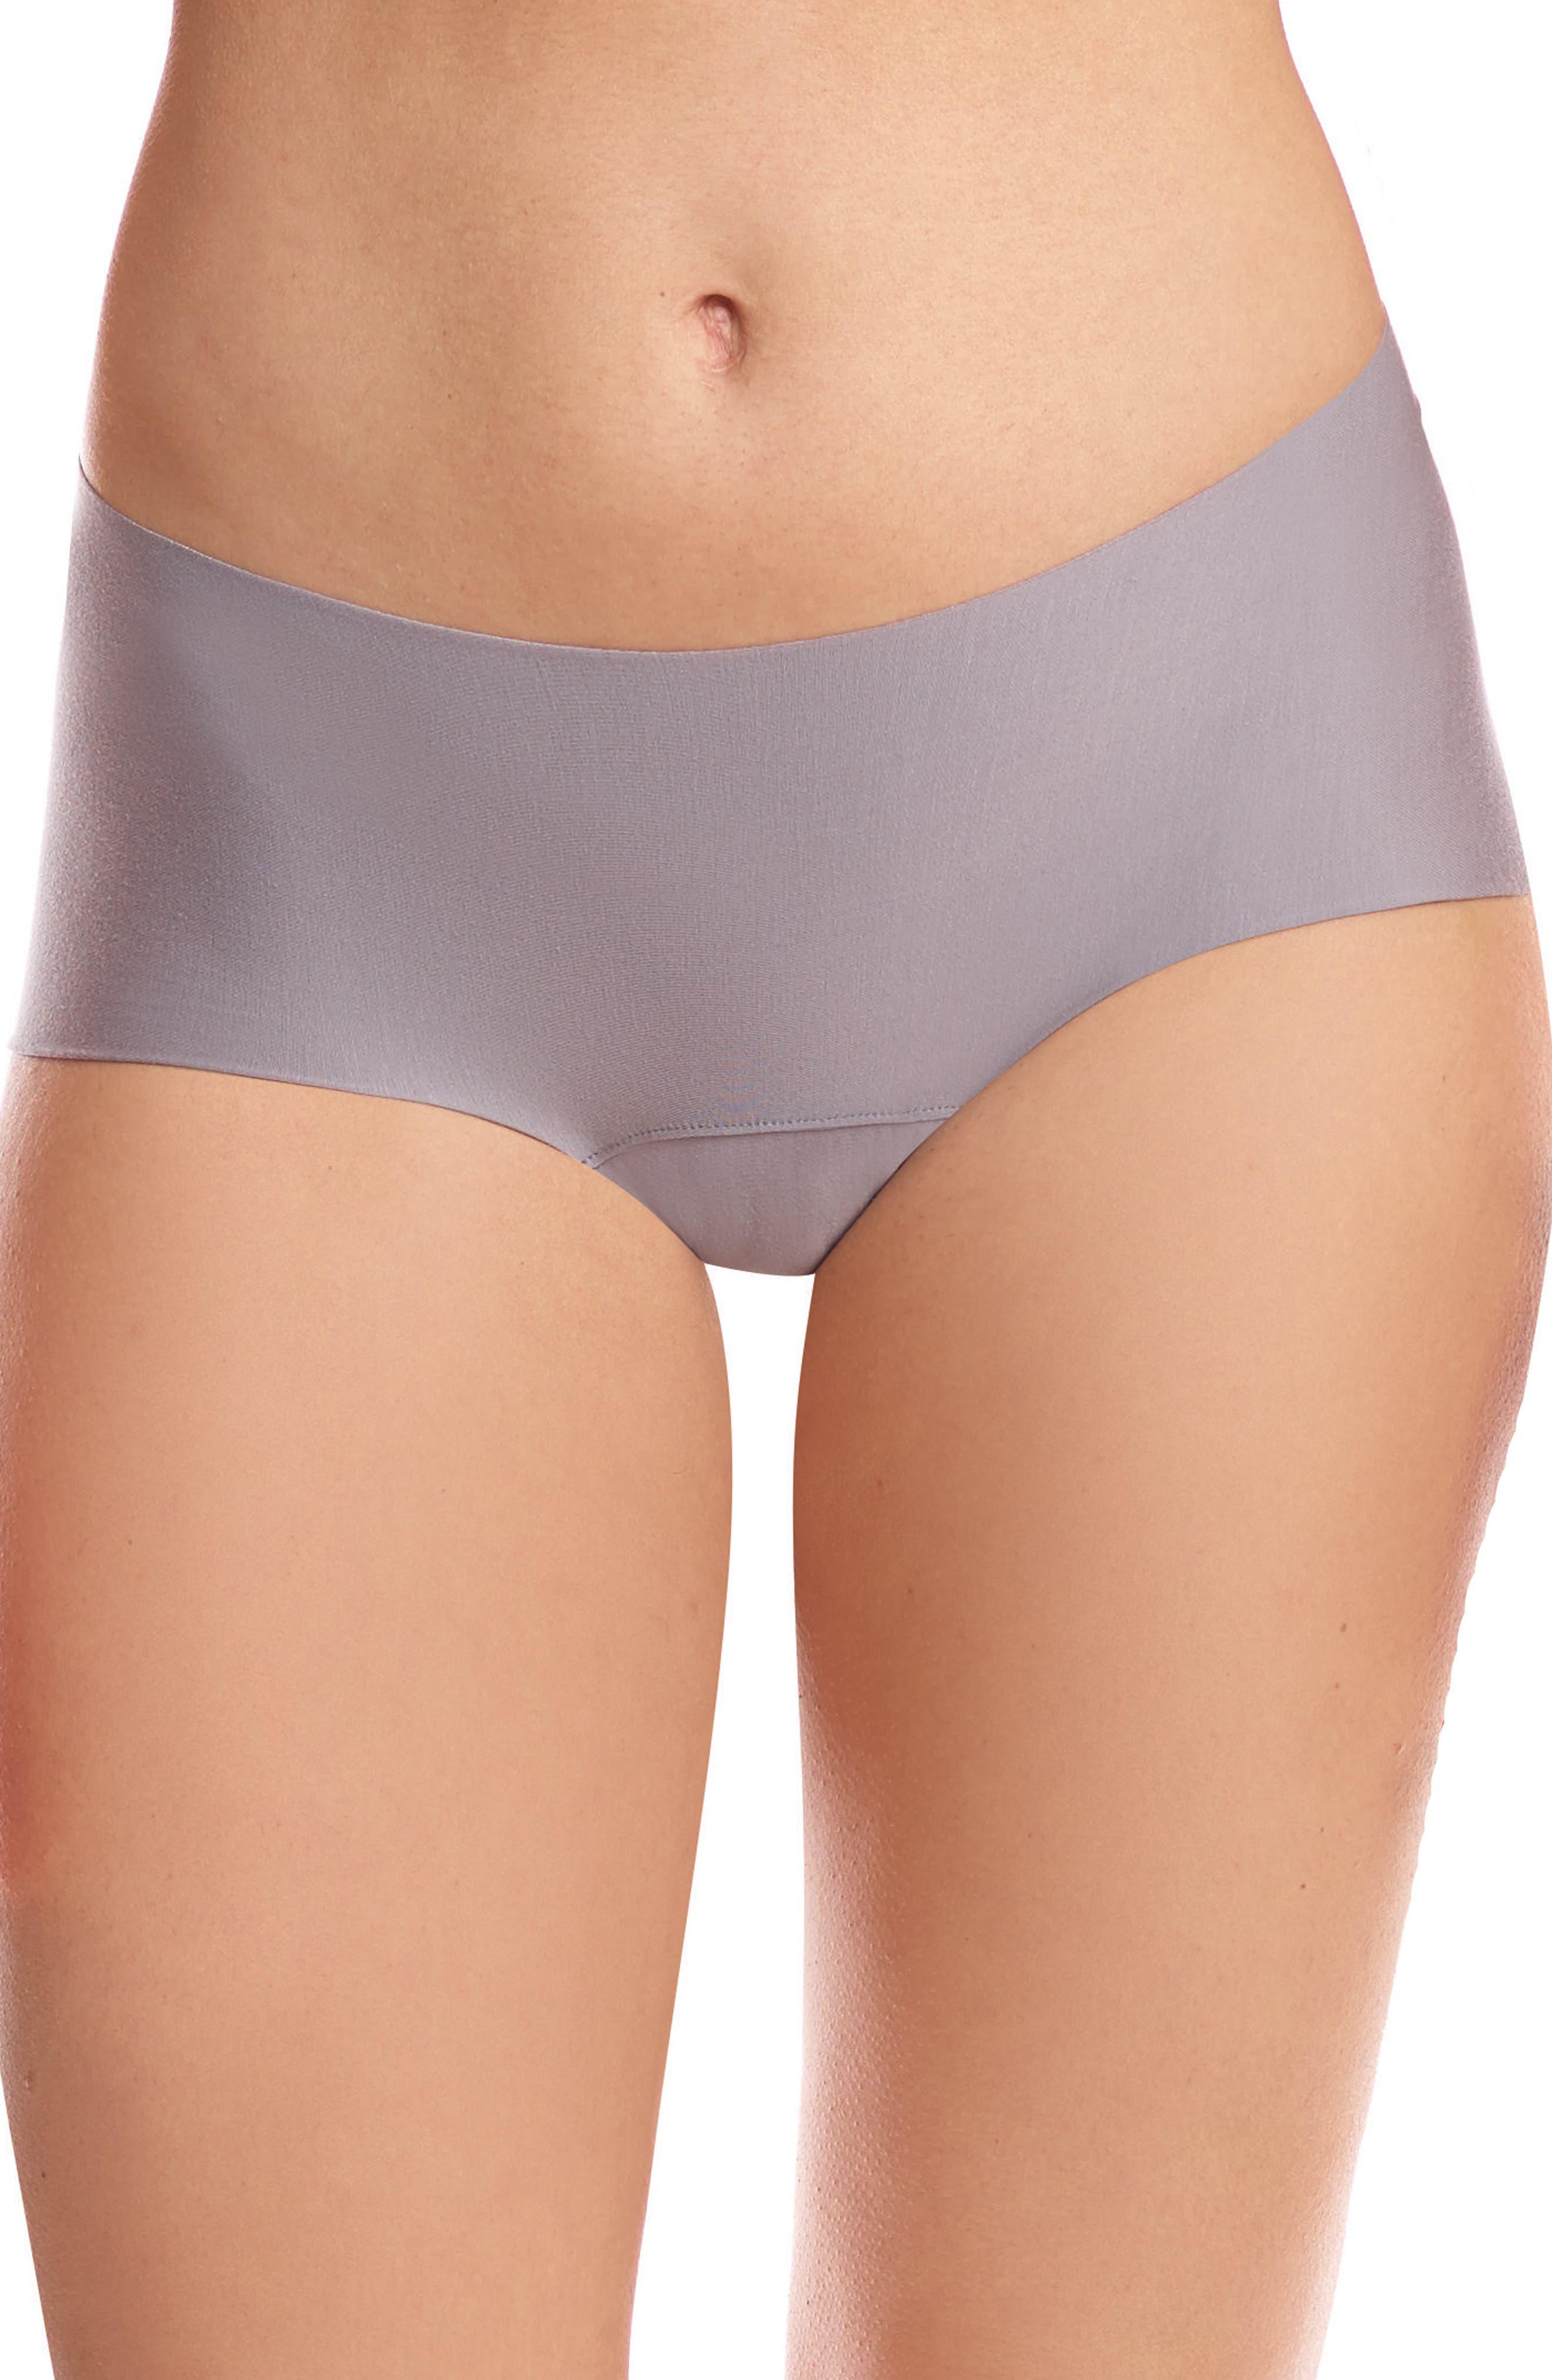 Butter Seamless Hipster Panties,                         Main,                         color, 034